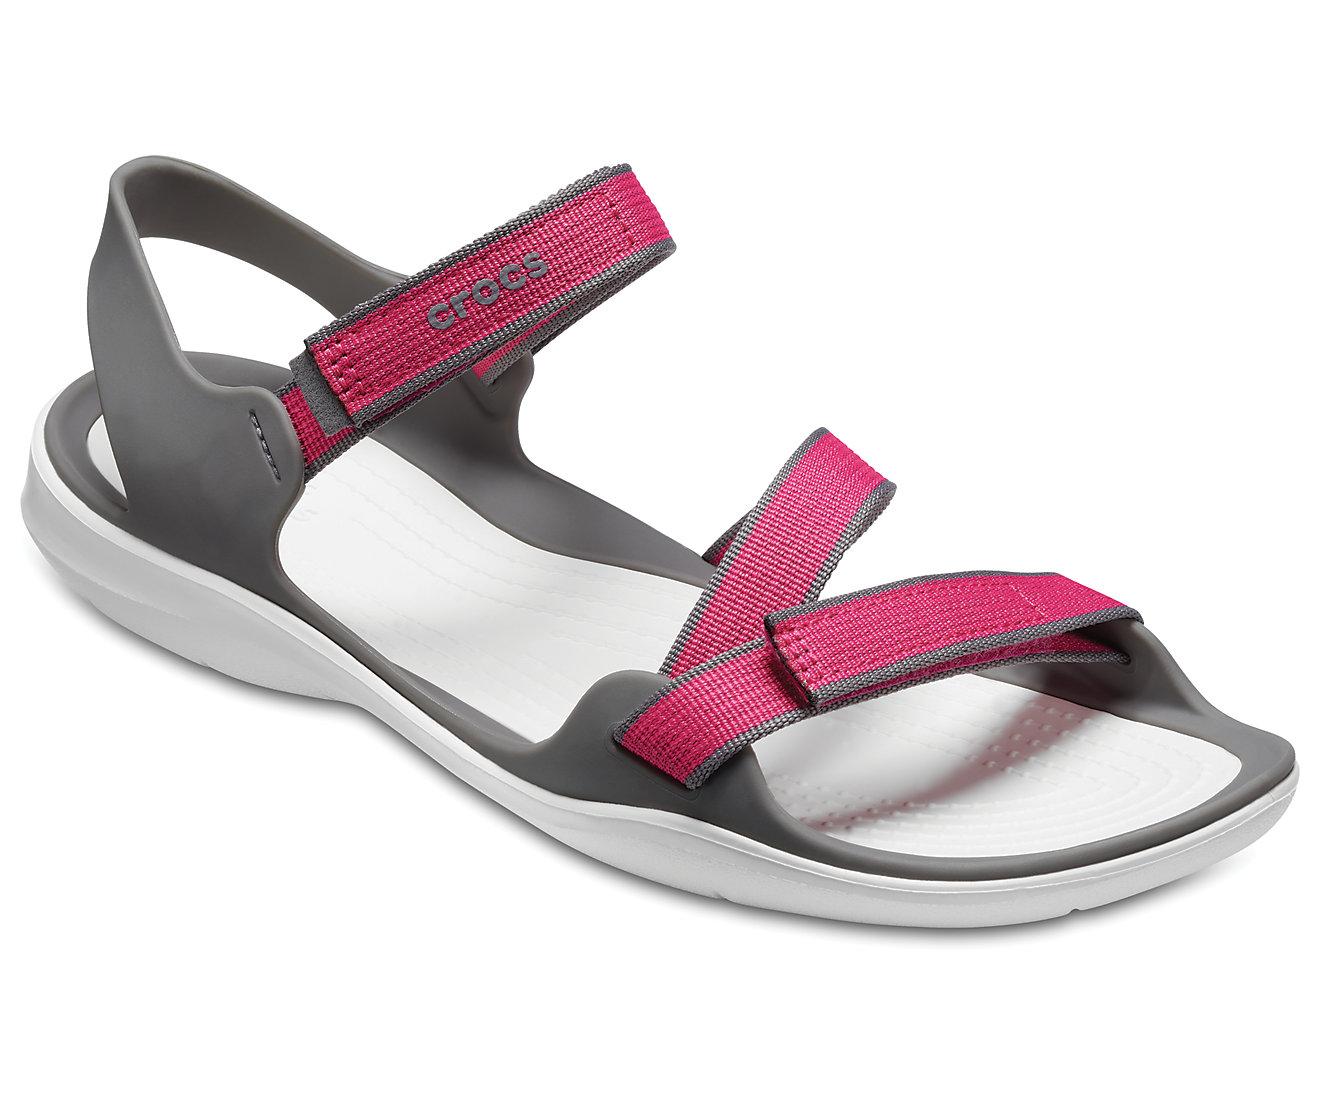 Crocs Women's Swiftwater Webbing Sandal 204804 Pink/Smoke Ροζ